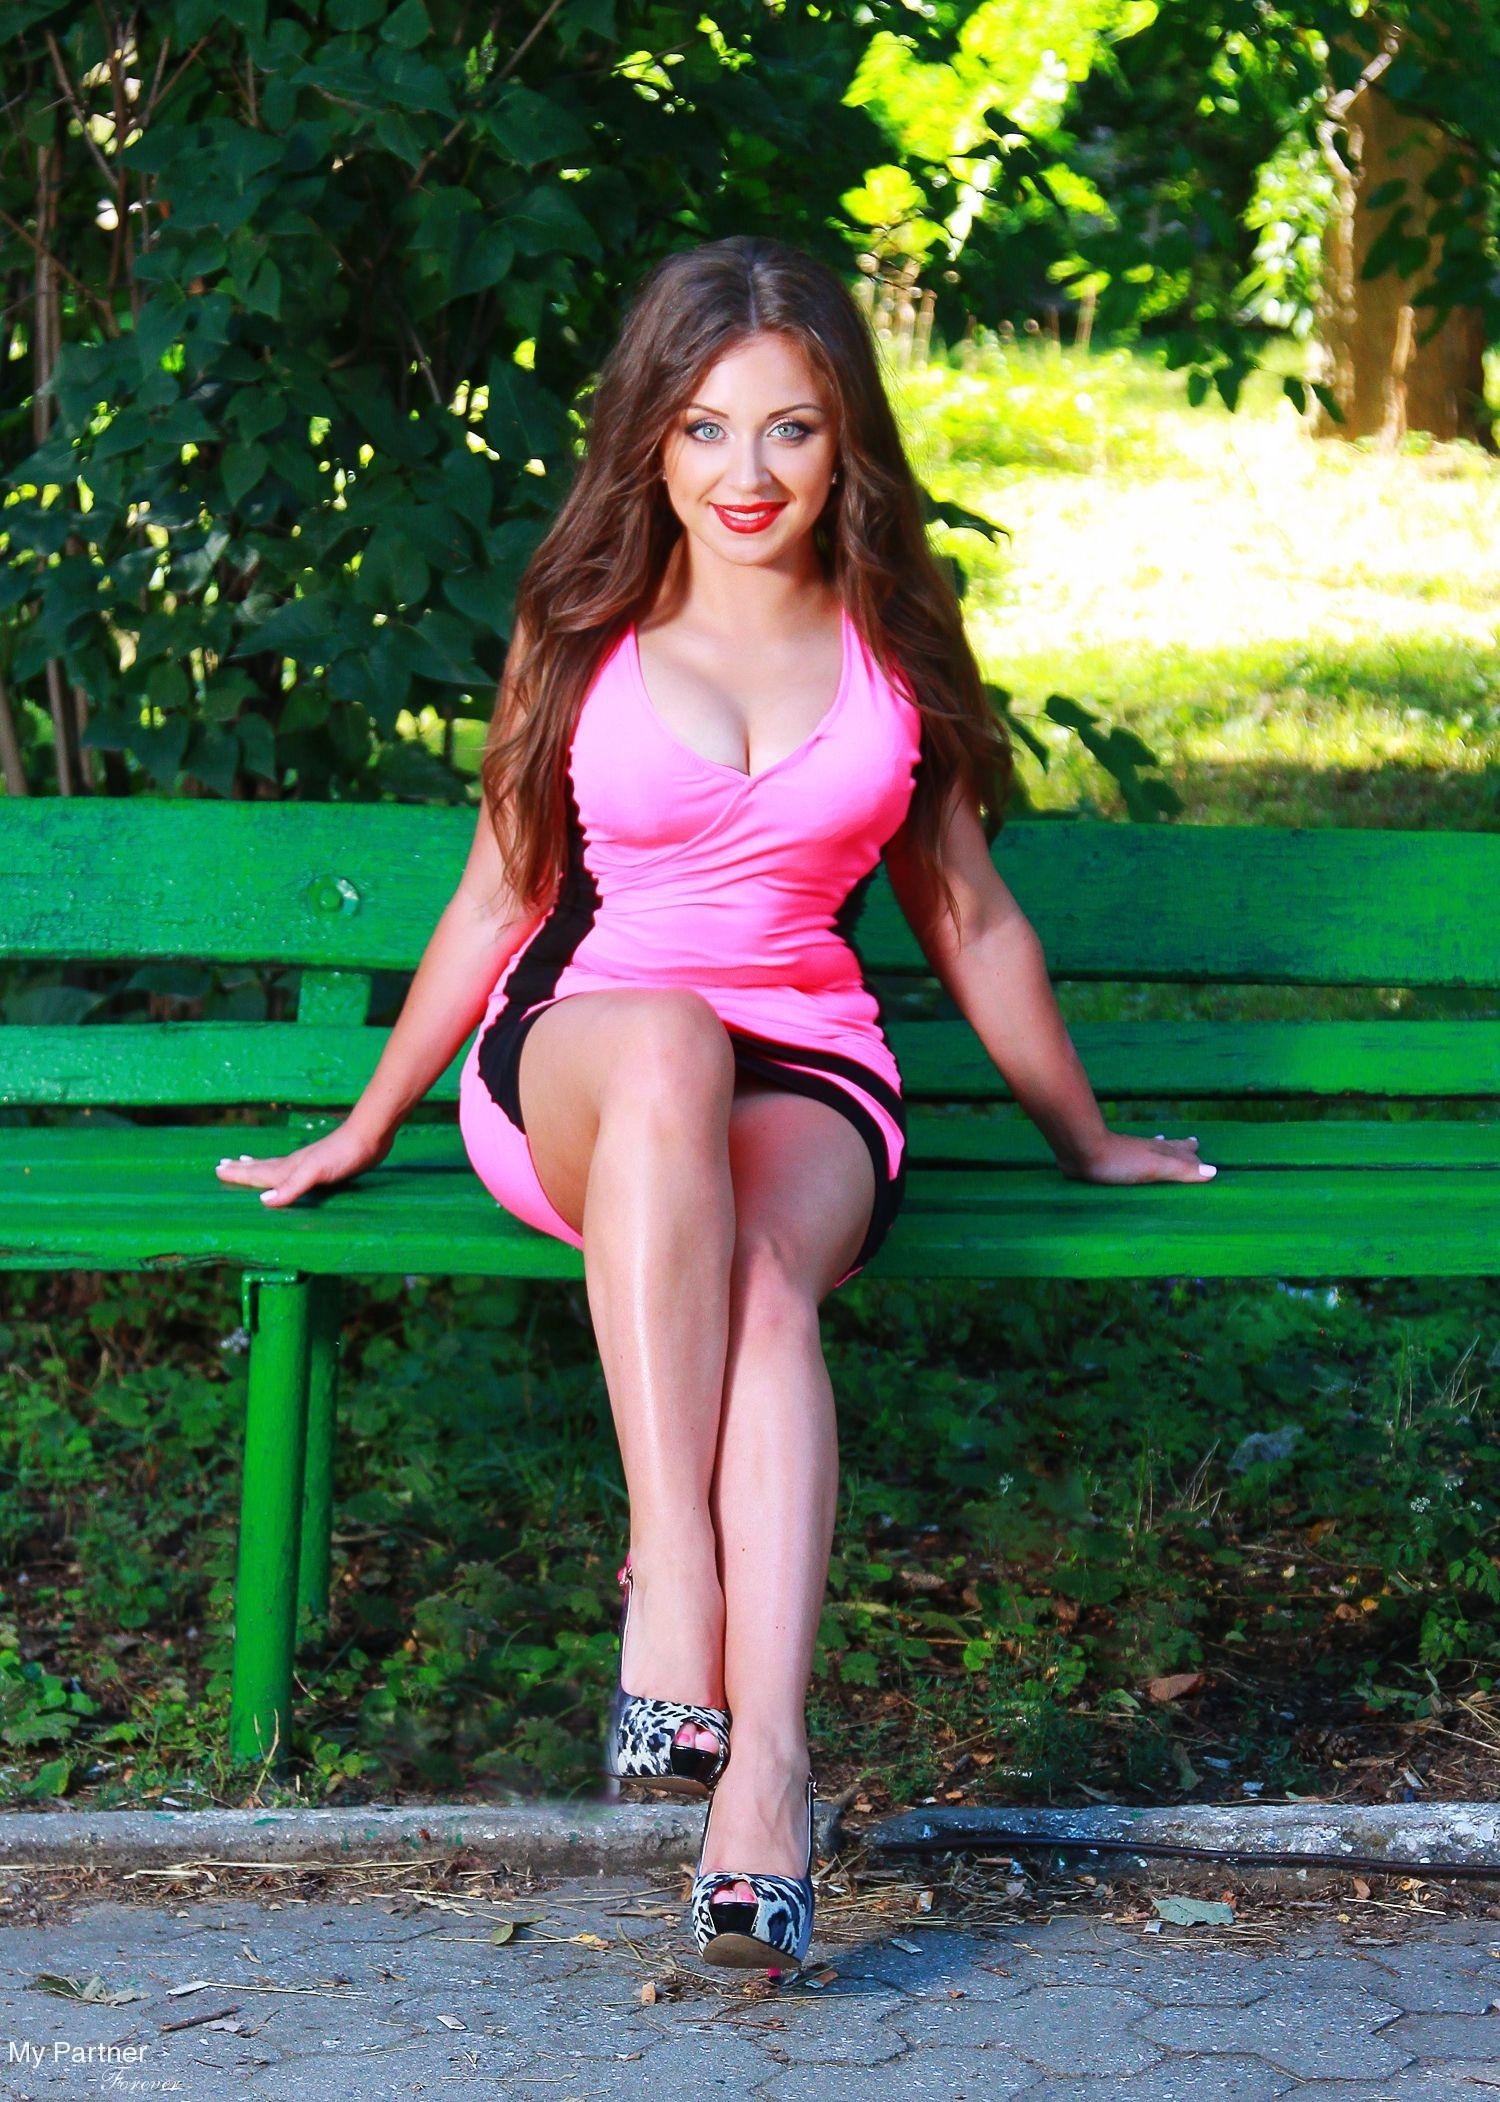 Ukraine Woman Olga From 7